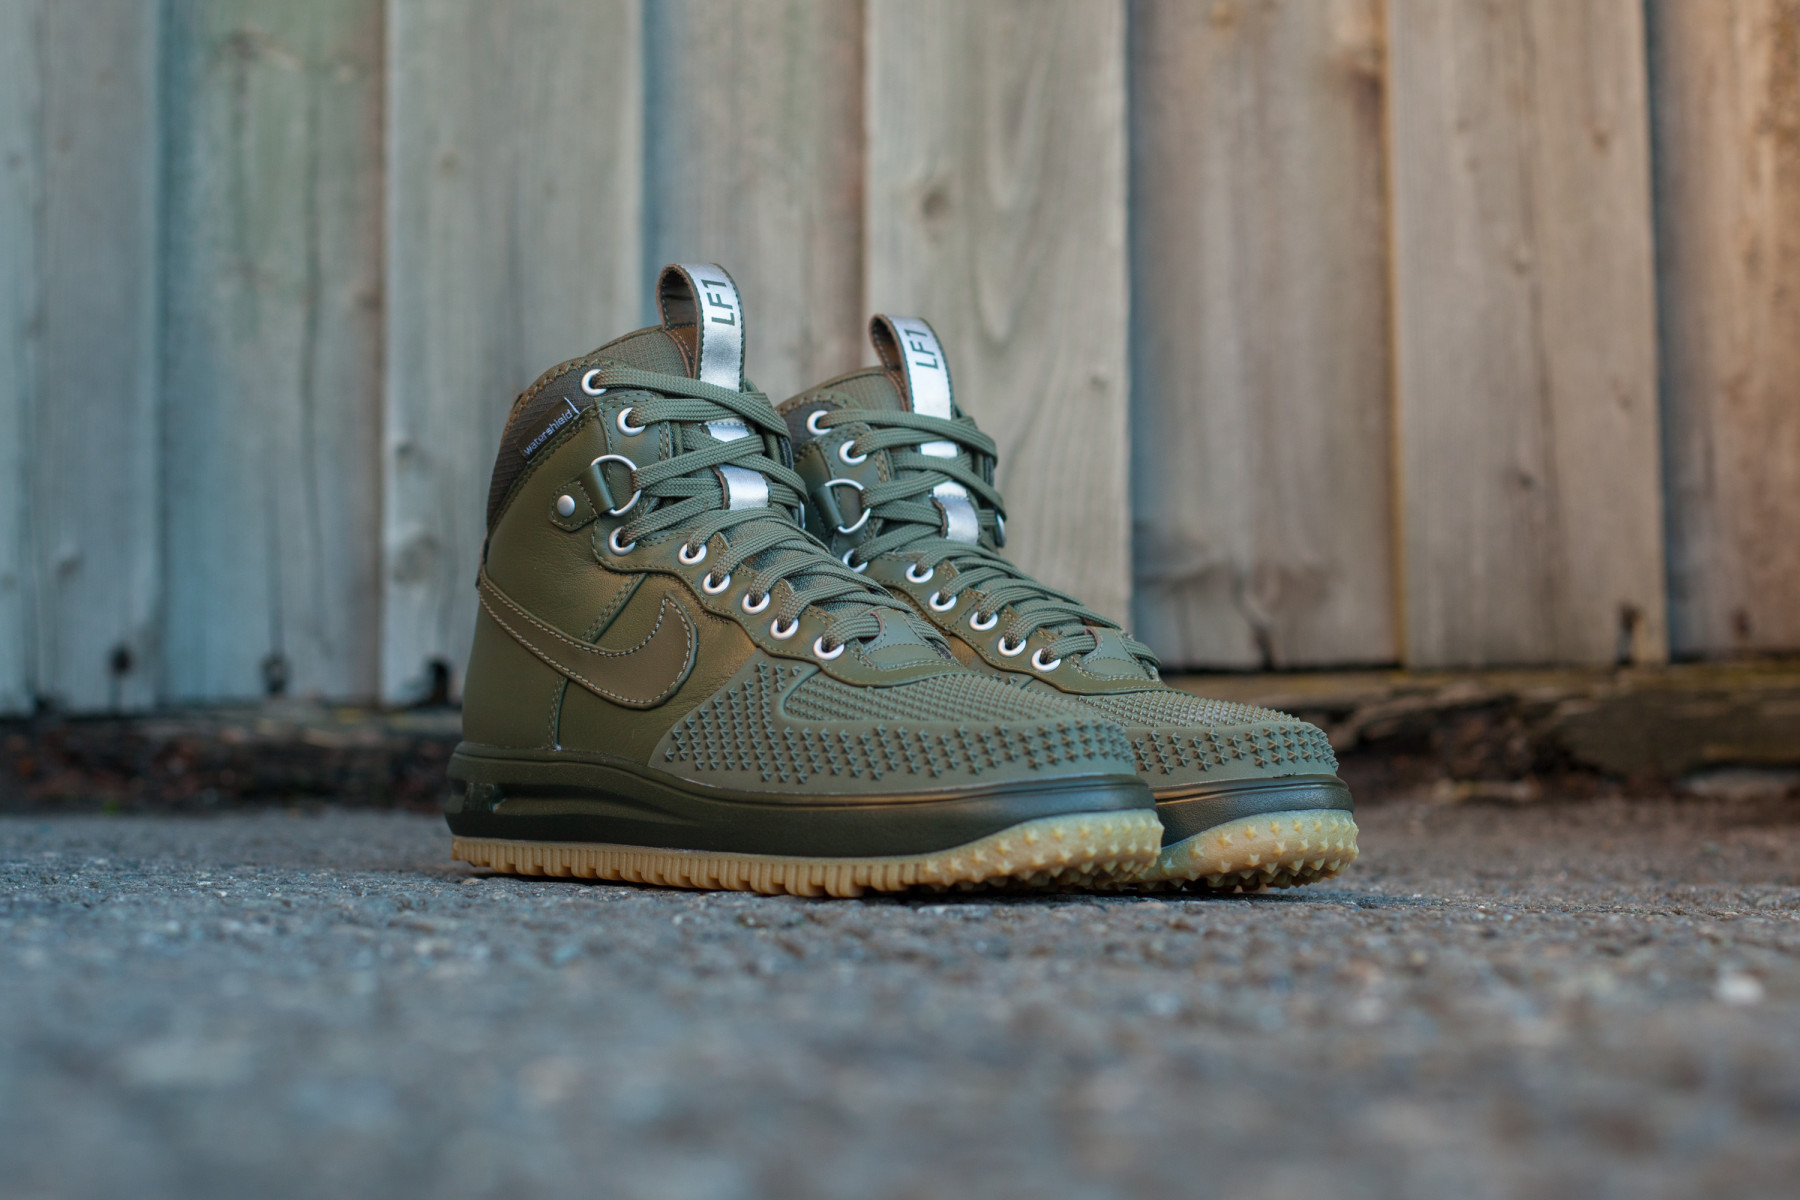 Nike Lunar Force 1 Duckboot Herre Sneakers Sneaker.no